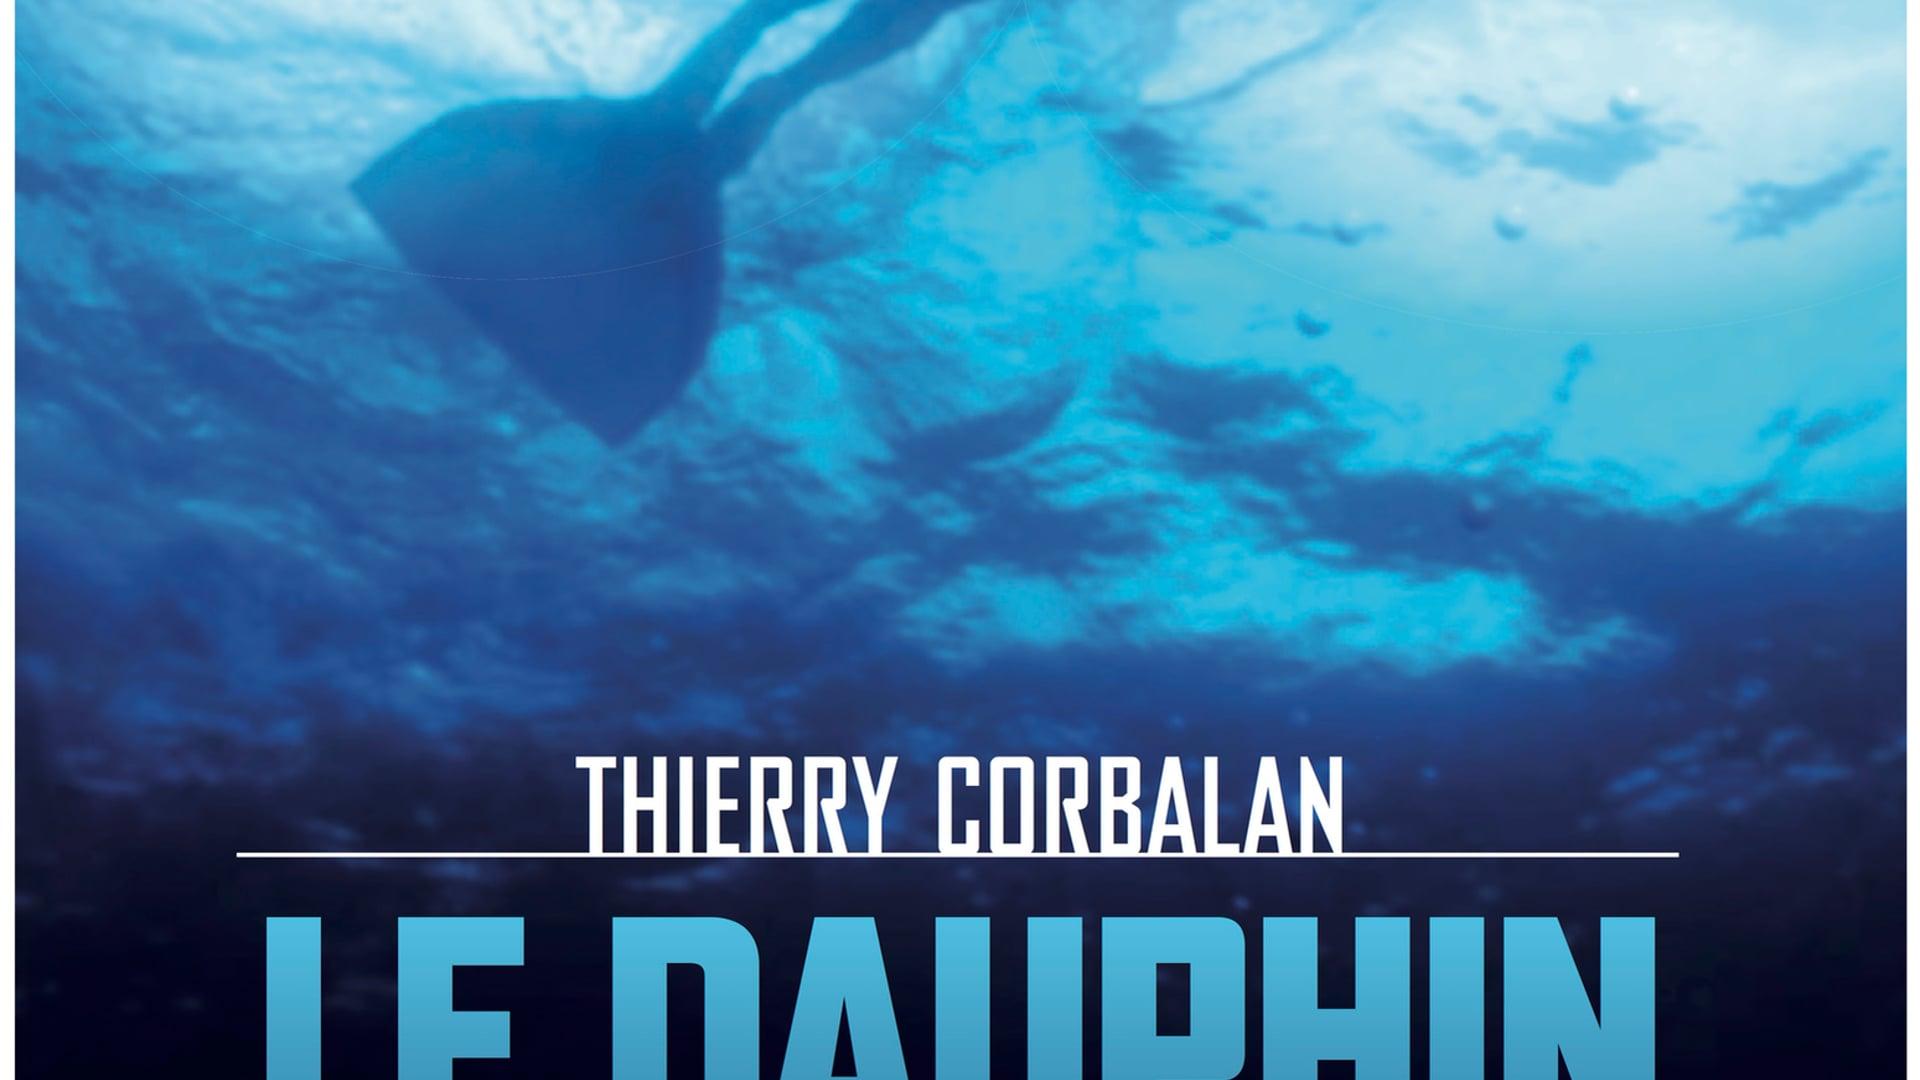 Thierry Corbalan, le dauphin corse - Fabrice Marinoni / VNPROD-Mecanos productions